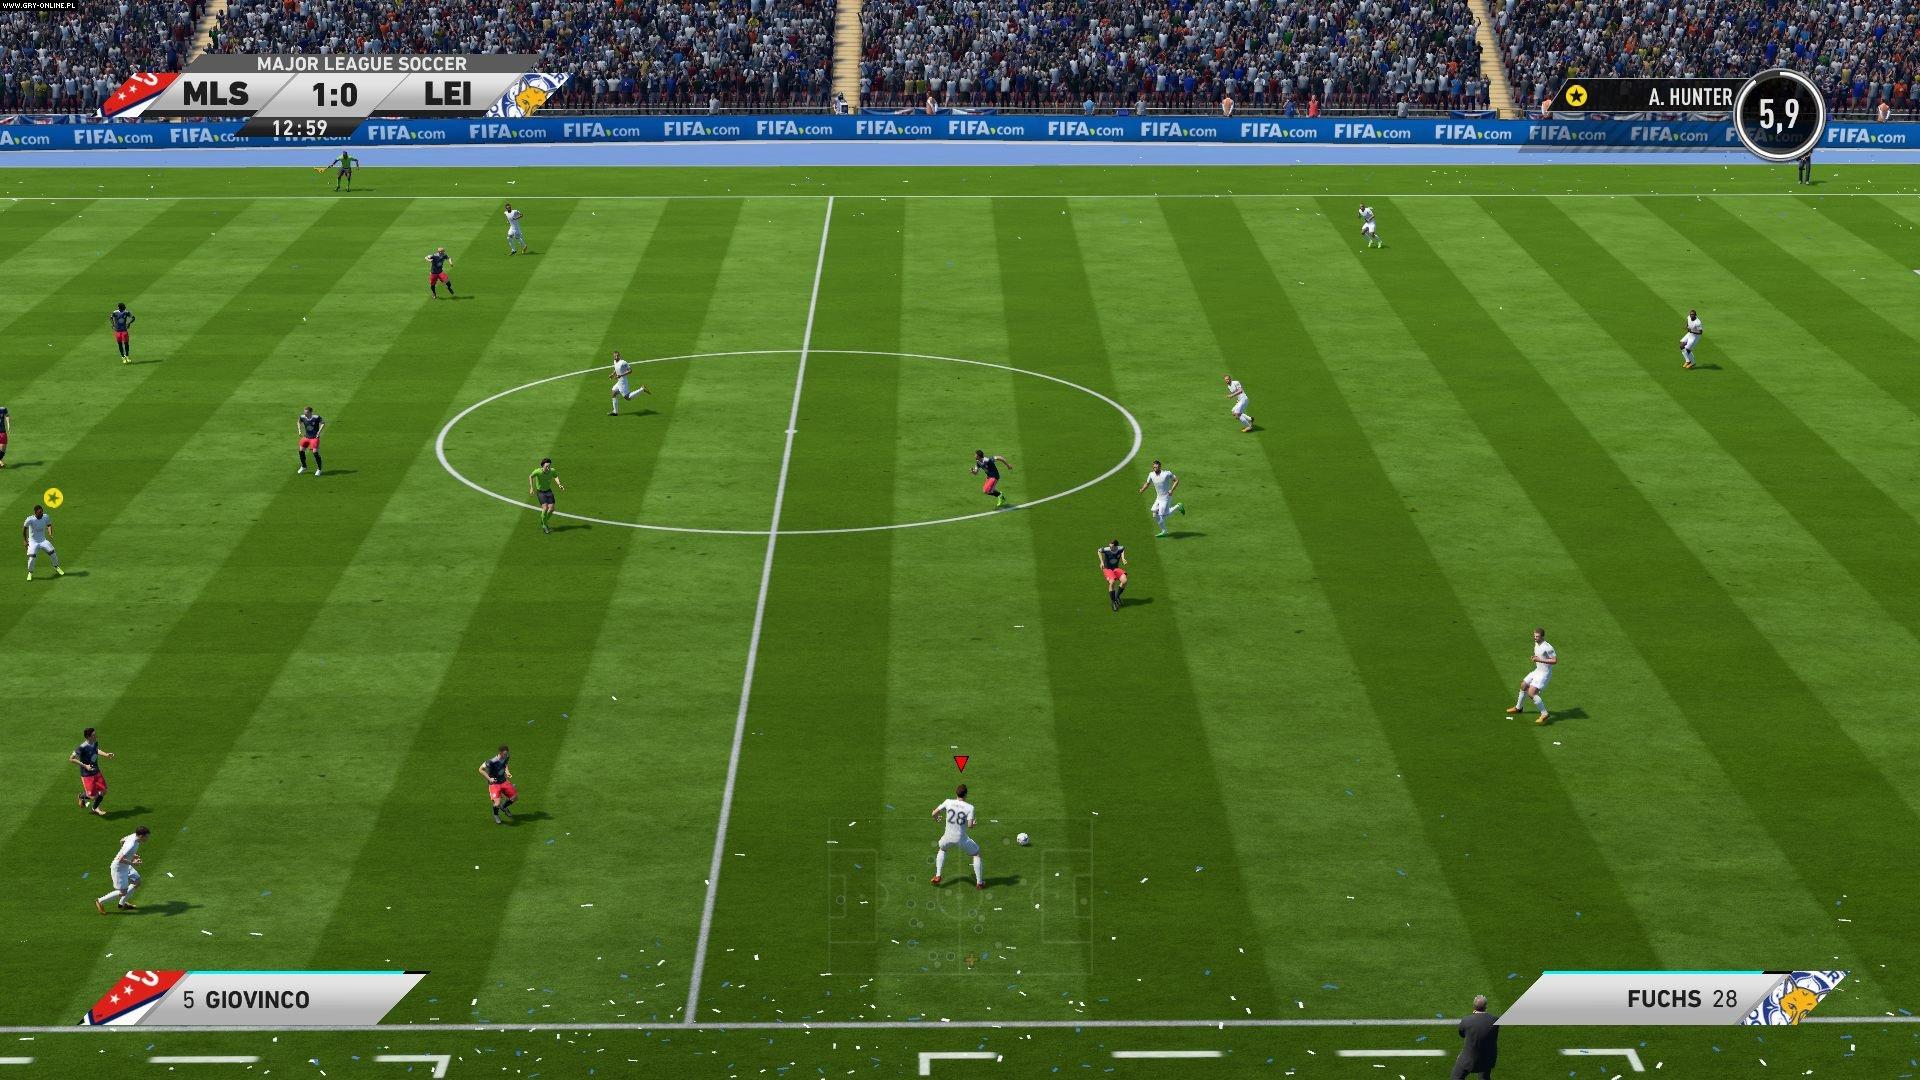 FIFA 18 PC PS4 XONE Games Image 26 49 EA Sports